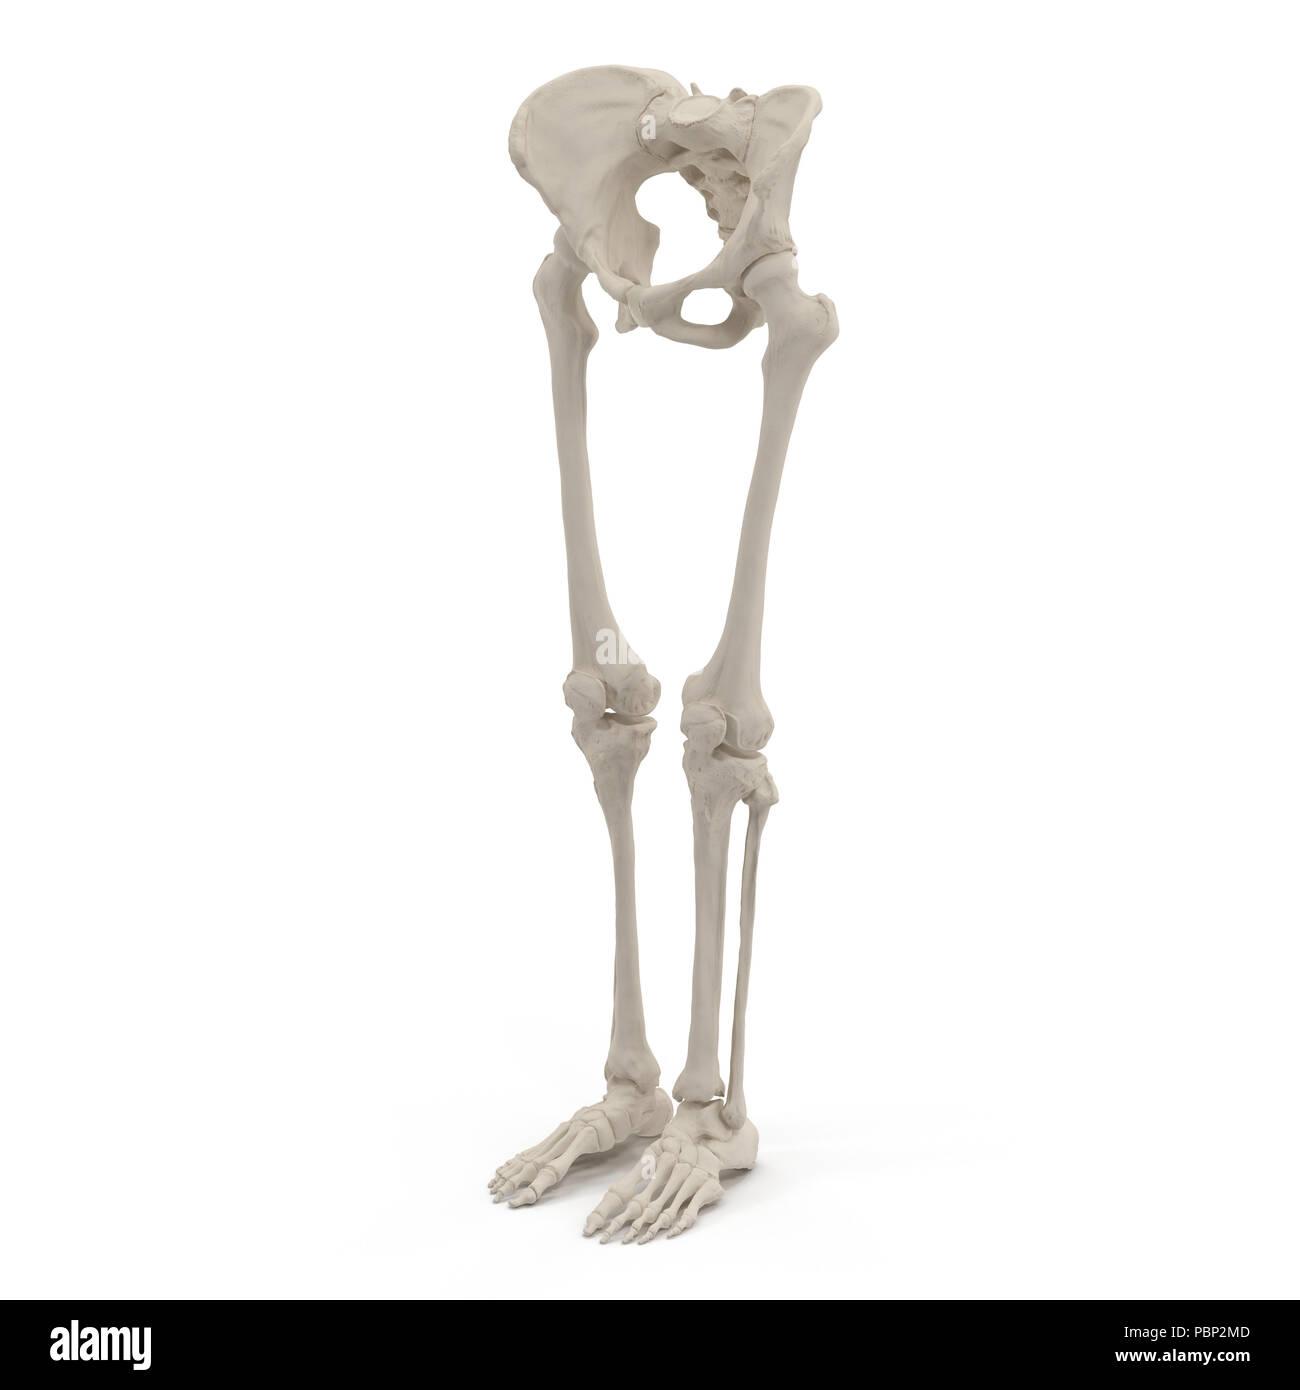 Skeleton Foot Model Stock Photos & Skeleton Foot Model Stock Images